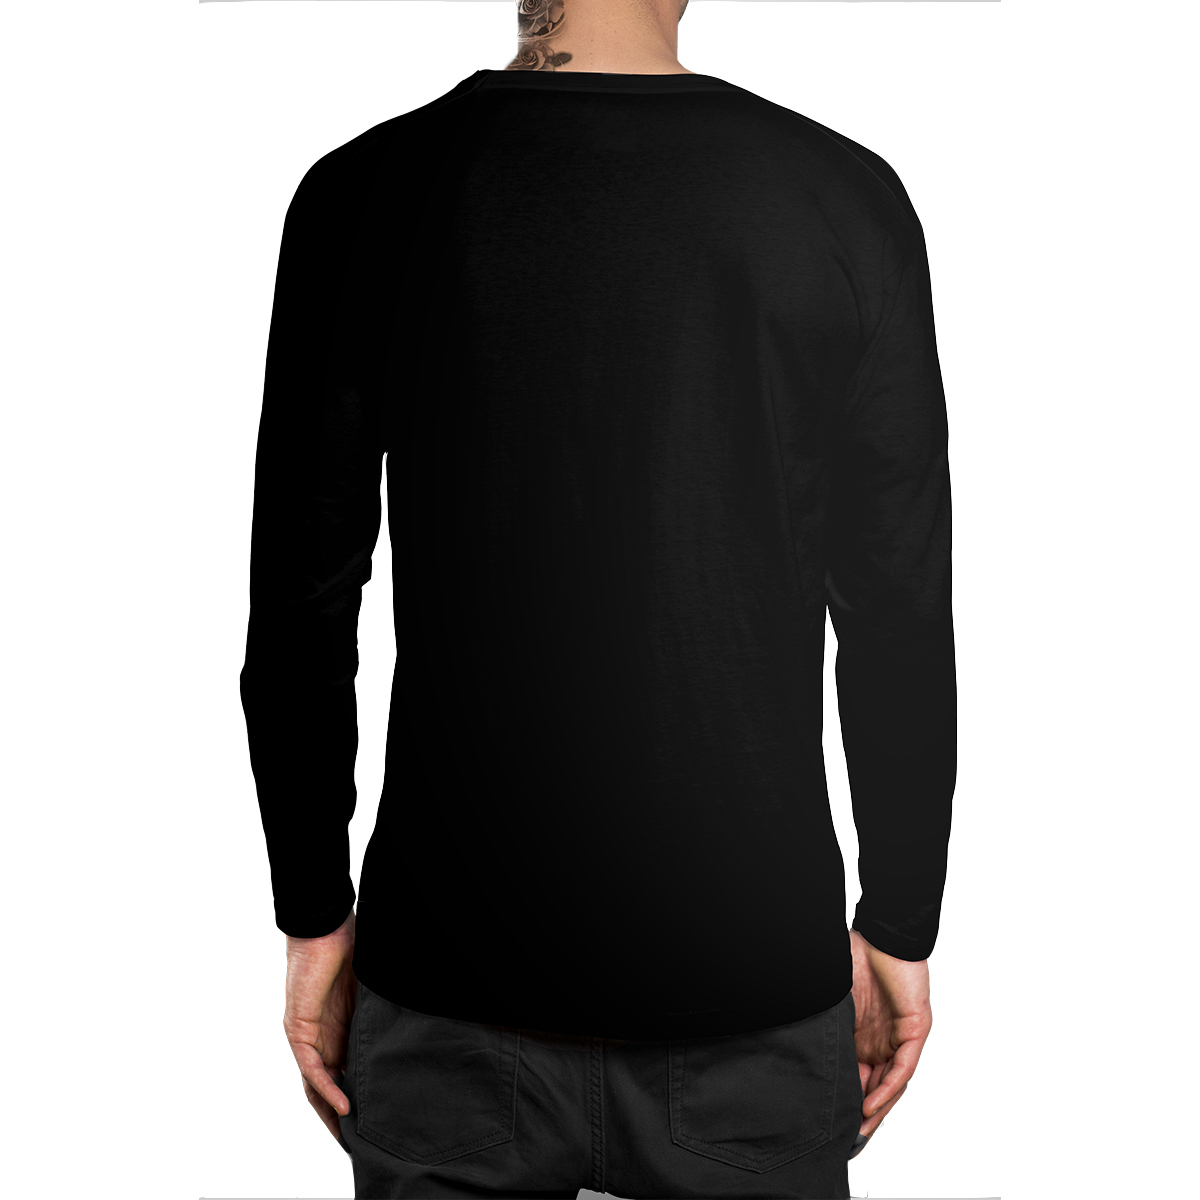 Stompy Camiseta Manga Longa Modelo 02